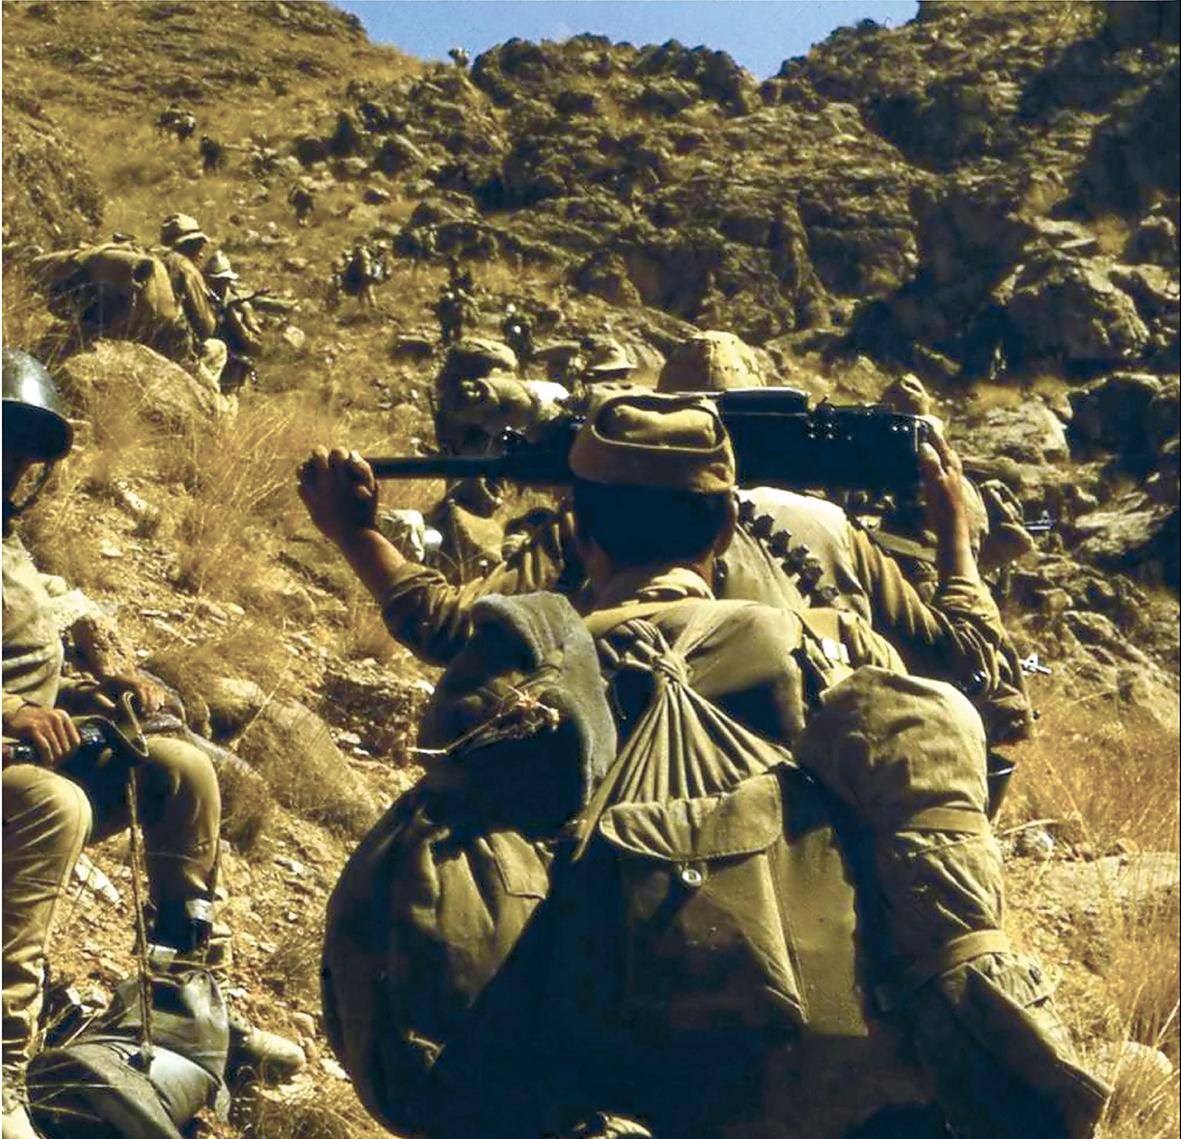 Soviet Afghanistan war - Page 7 Charikar_web